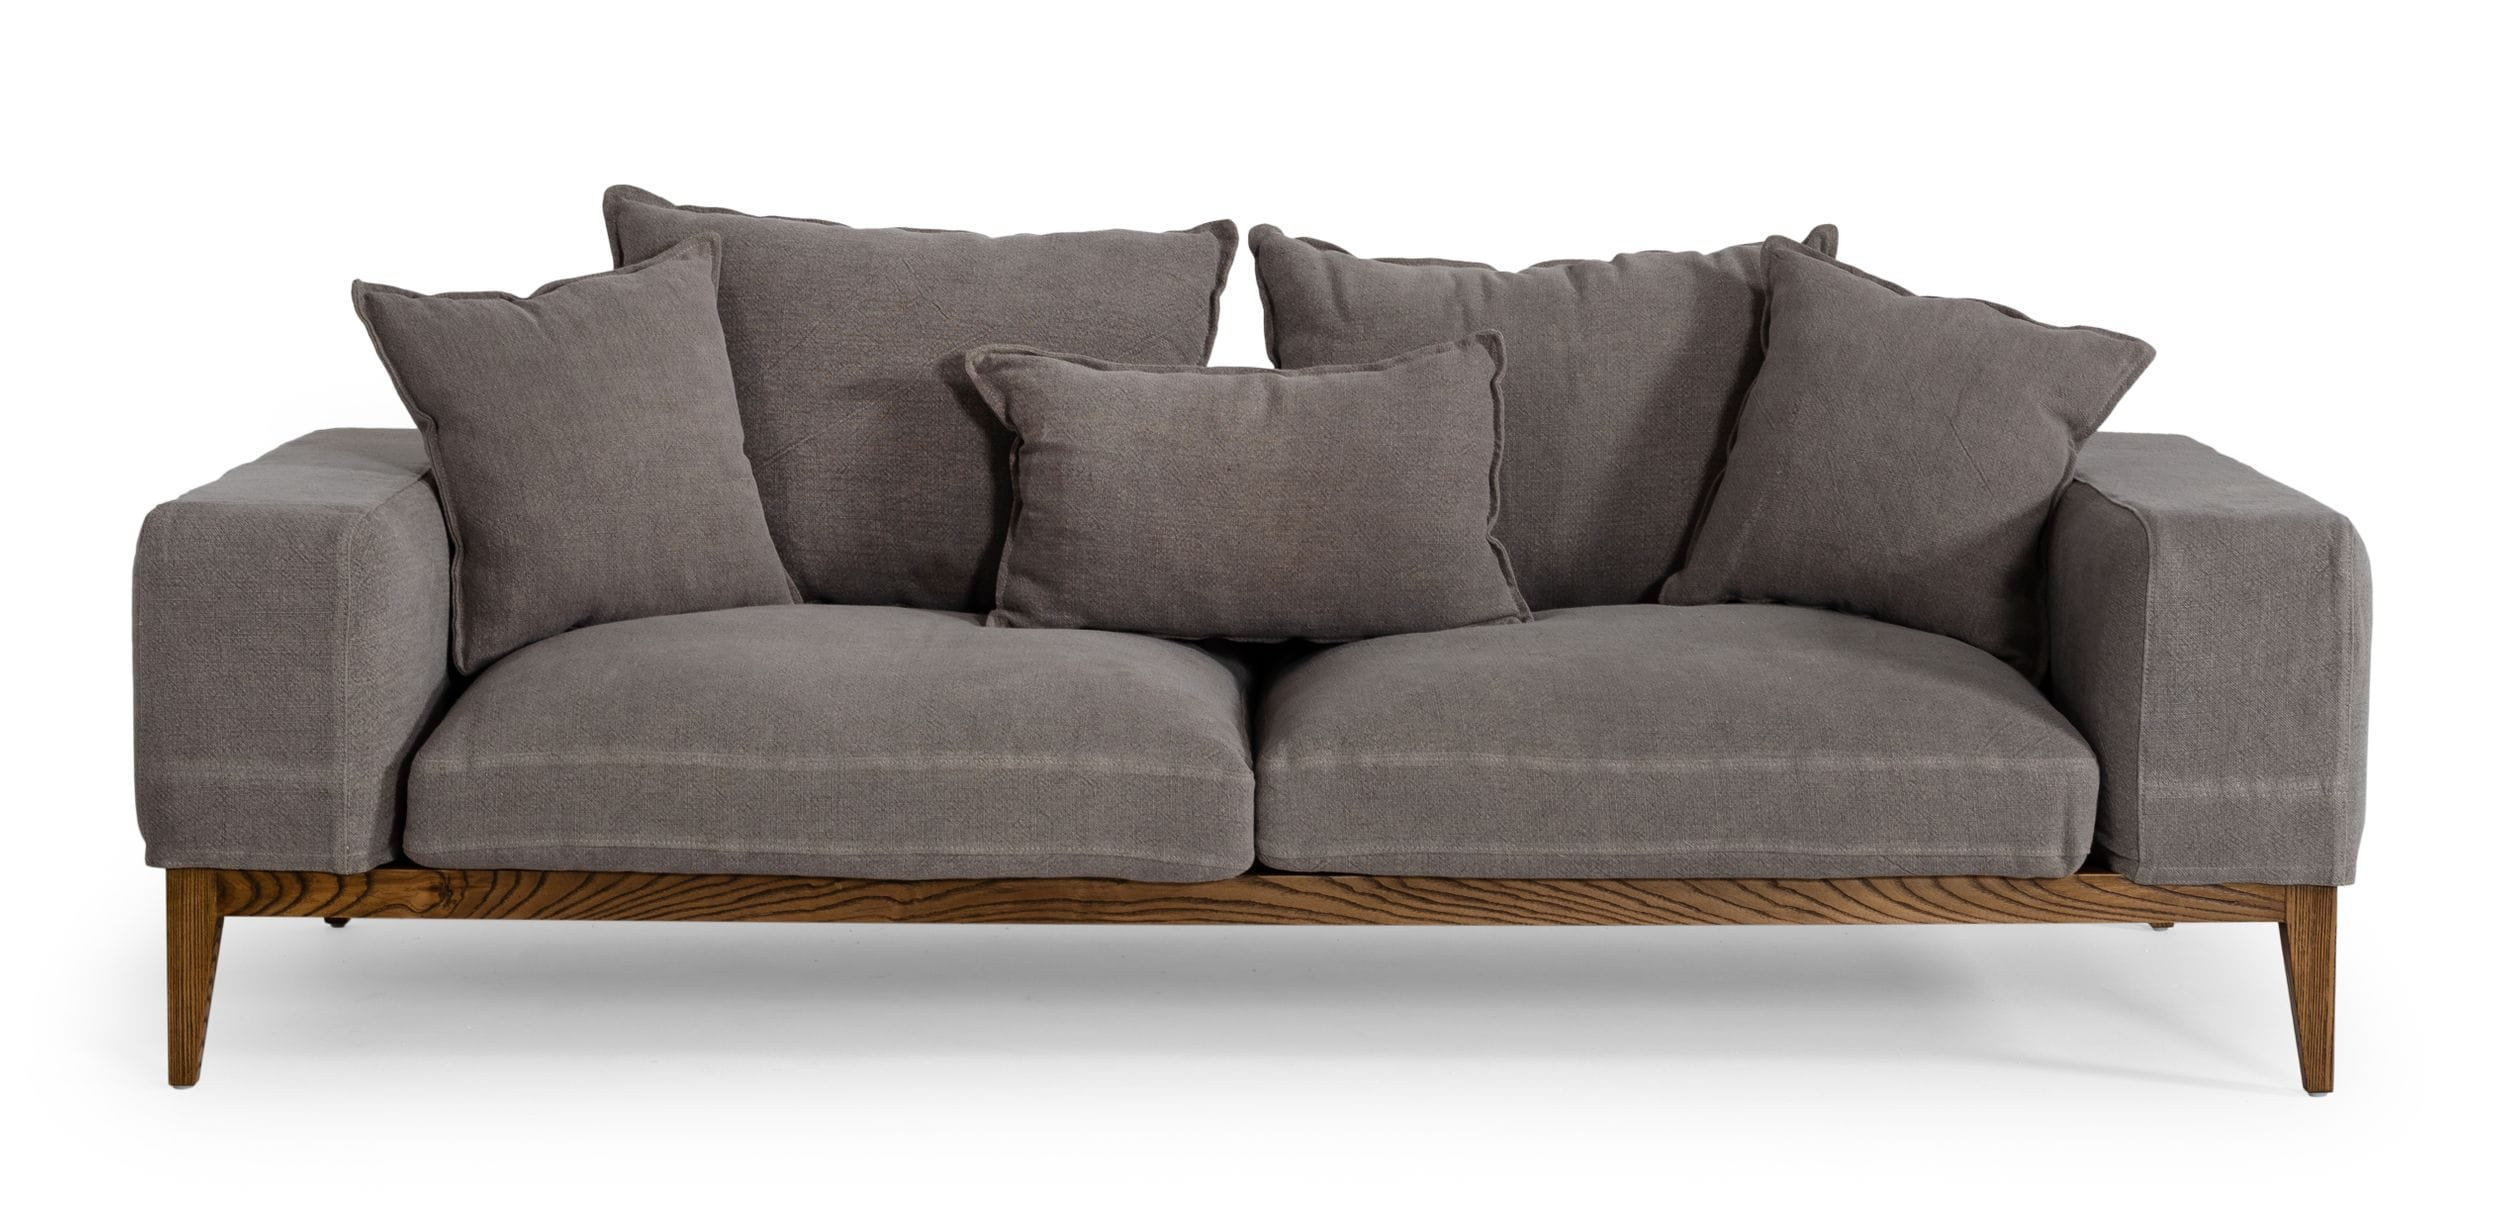 VIG Furniture Divani Casa Corina Modern Grey Fabric Sofa